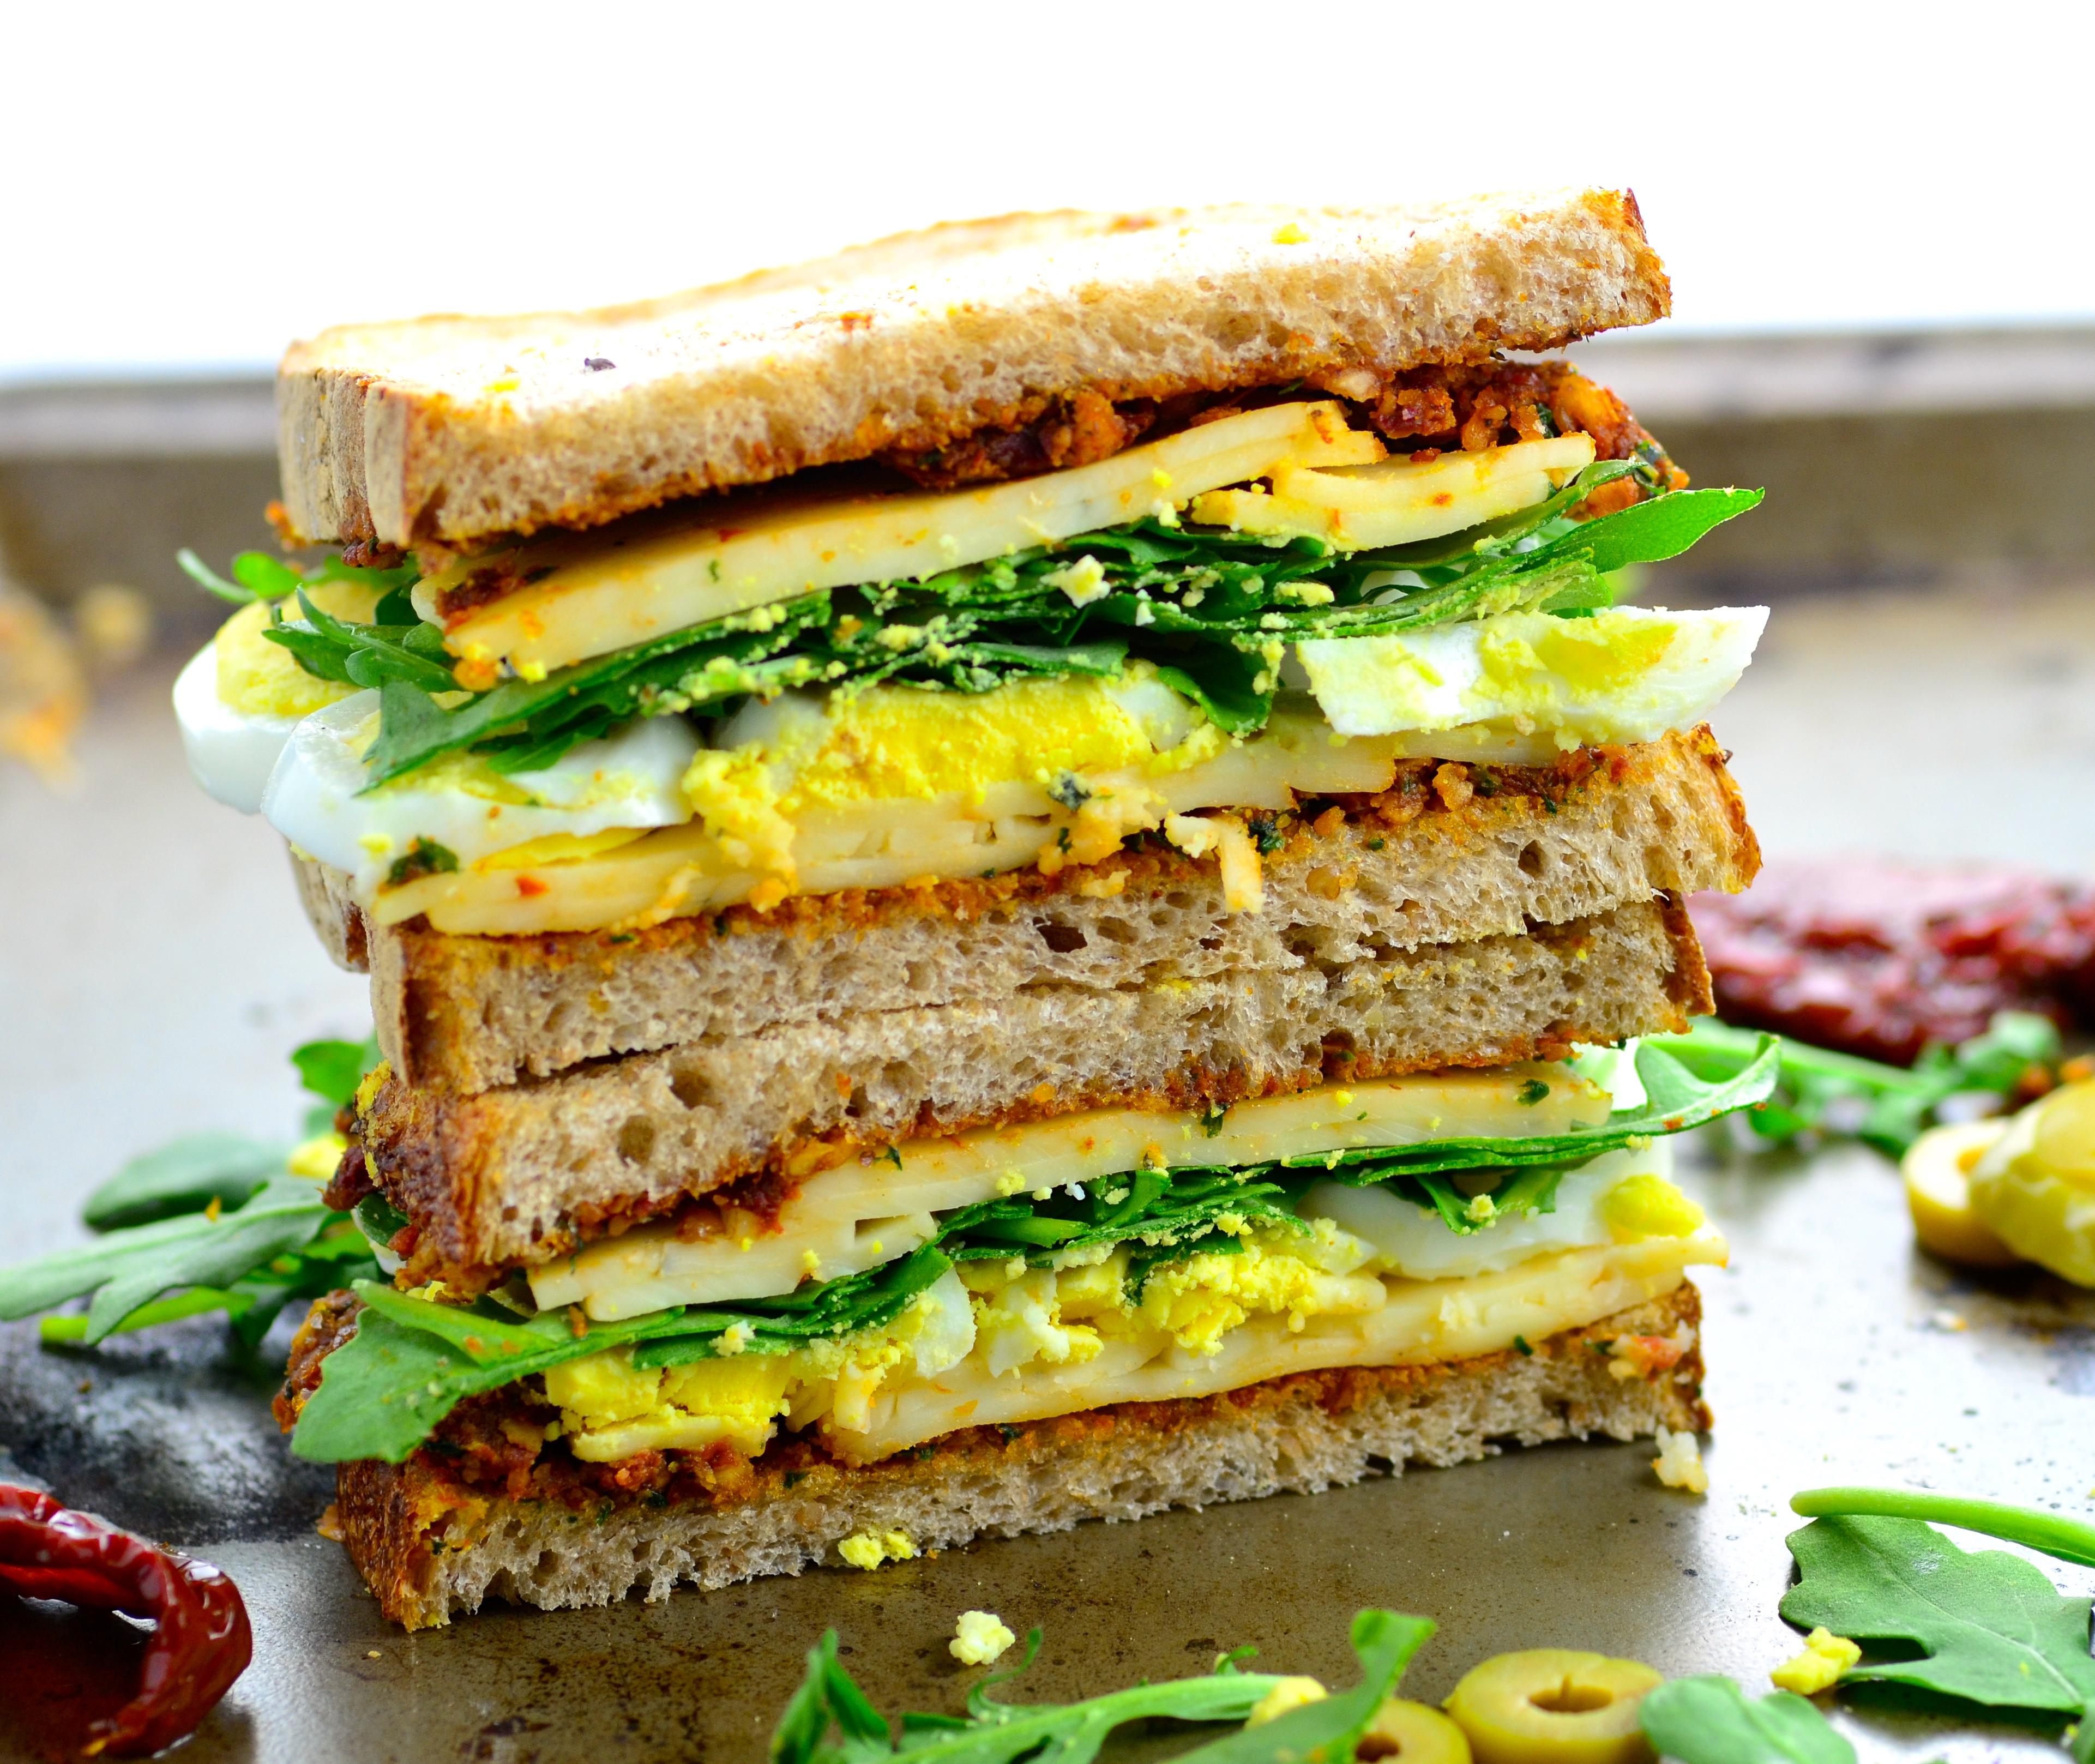 Tomato Olive Cheese Sandwich